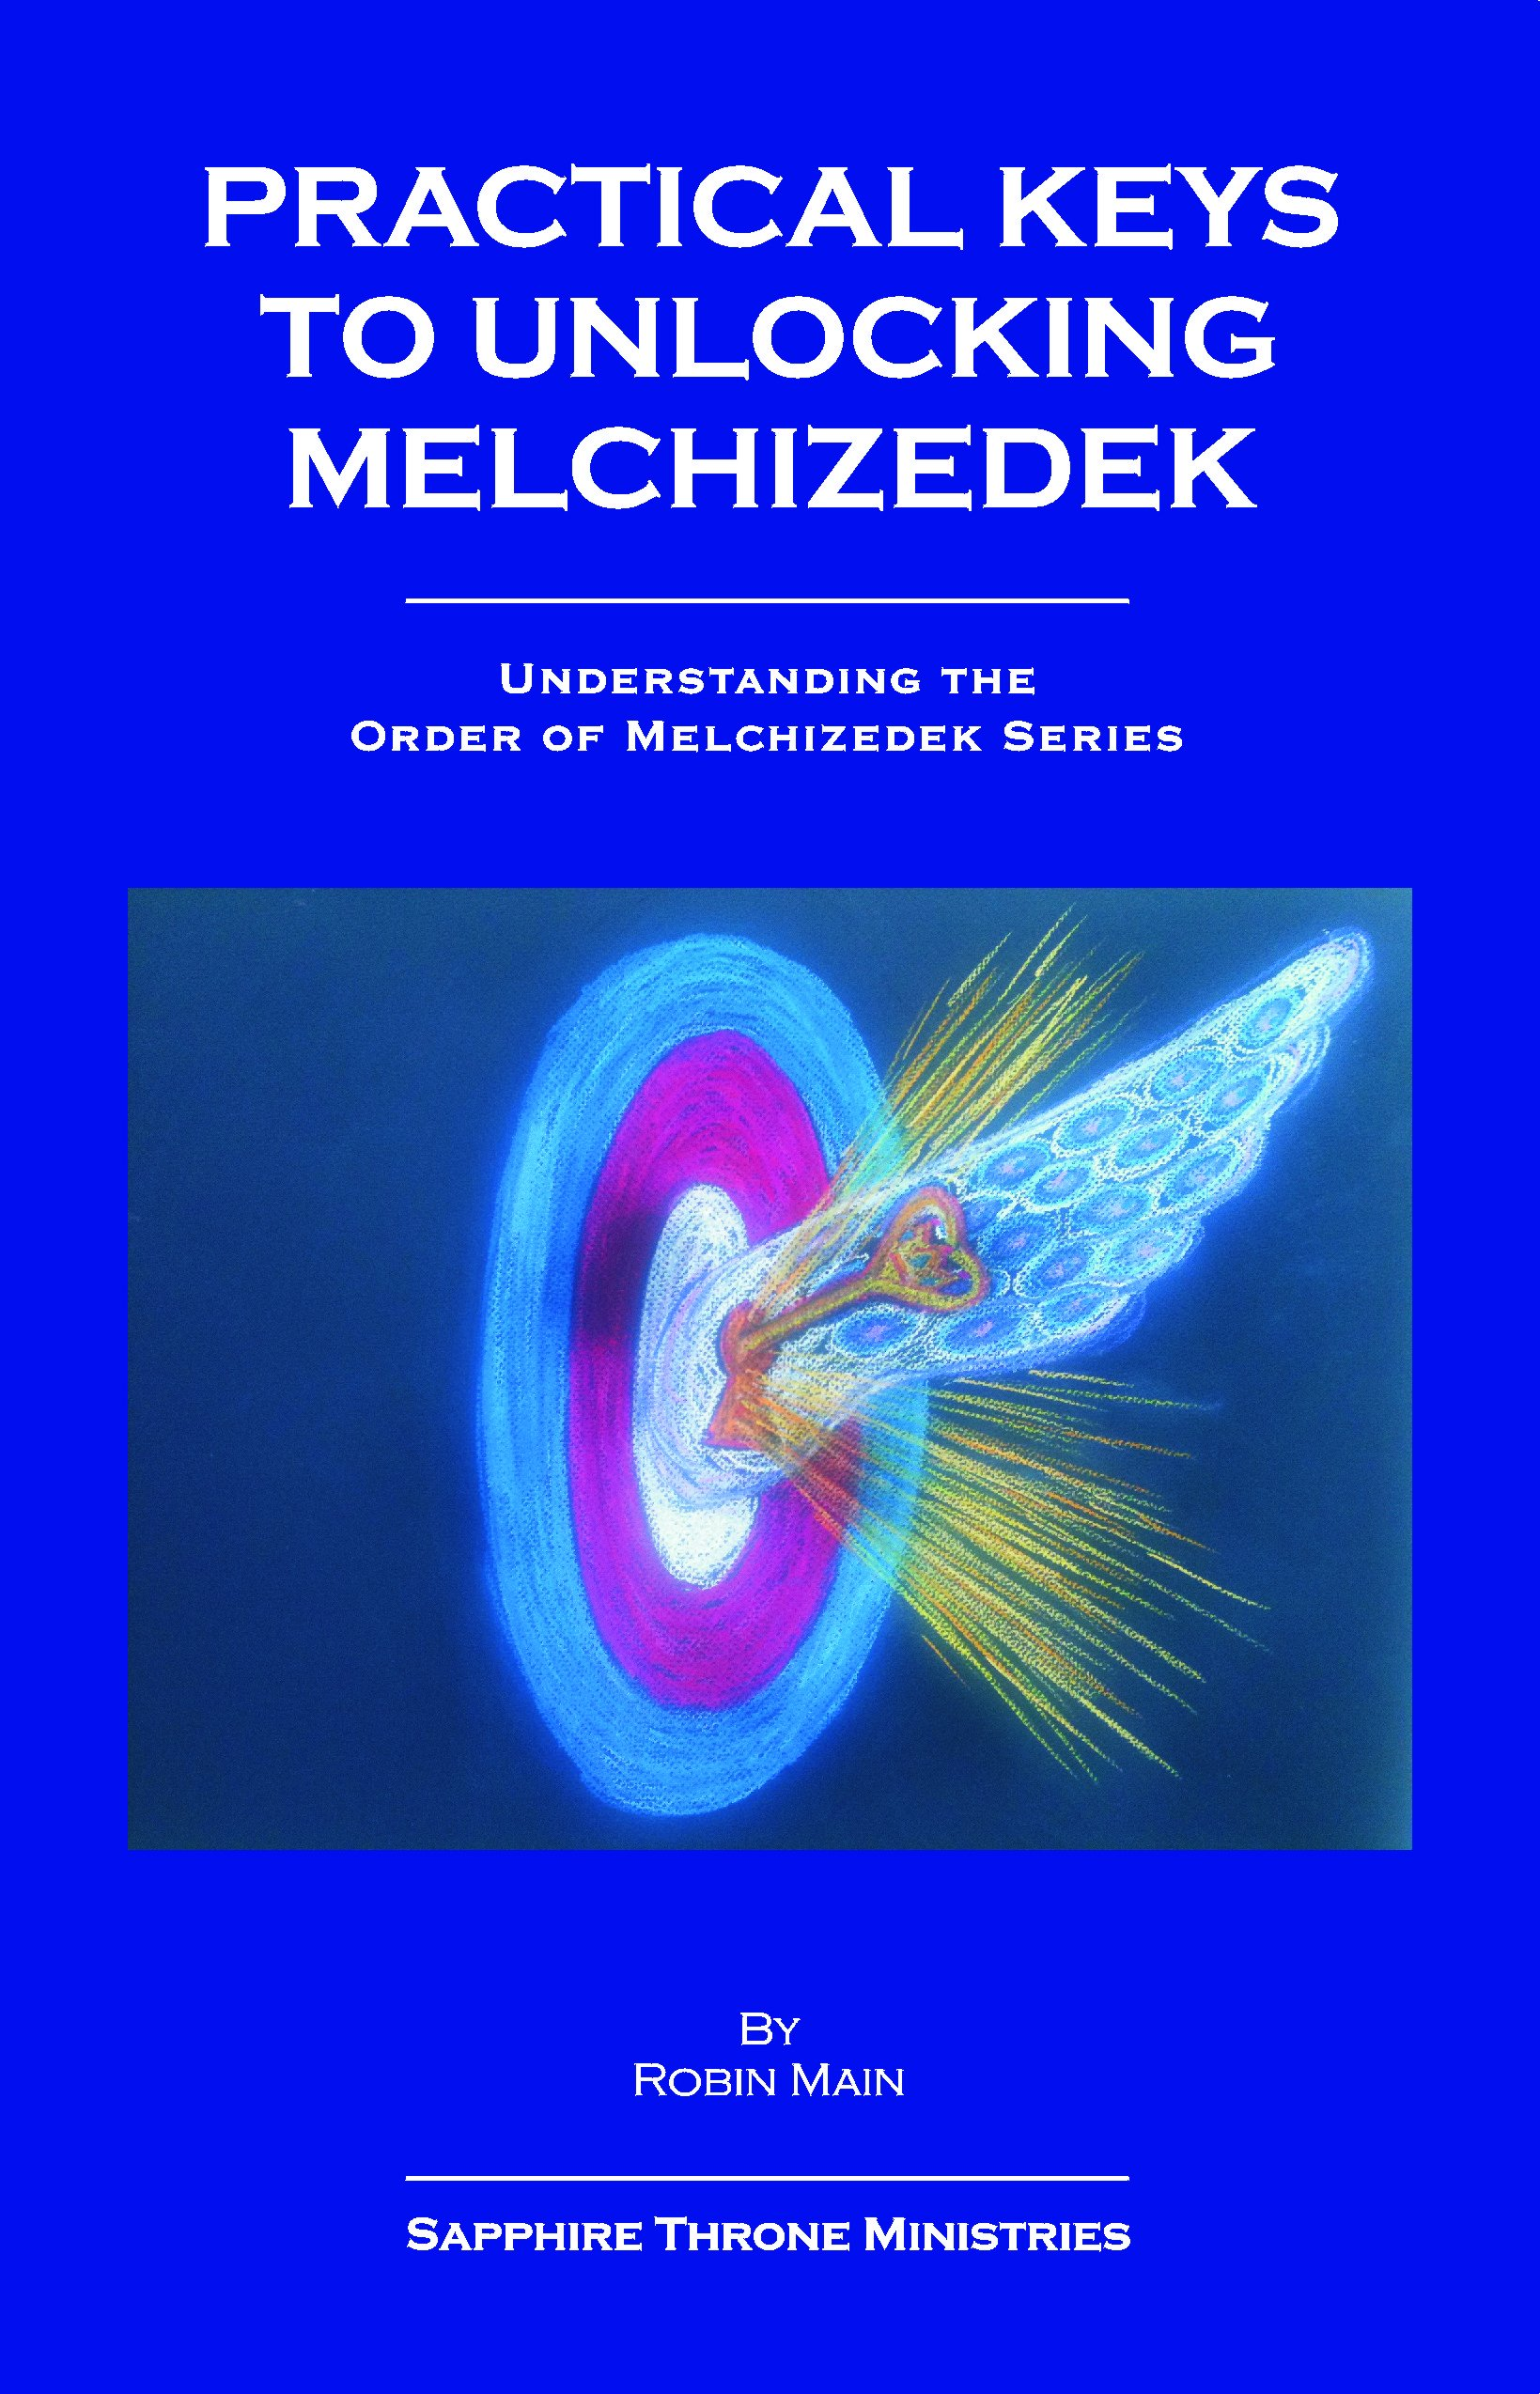 Practical Keys to Unlocking Melchizedek (Understanding the Order of